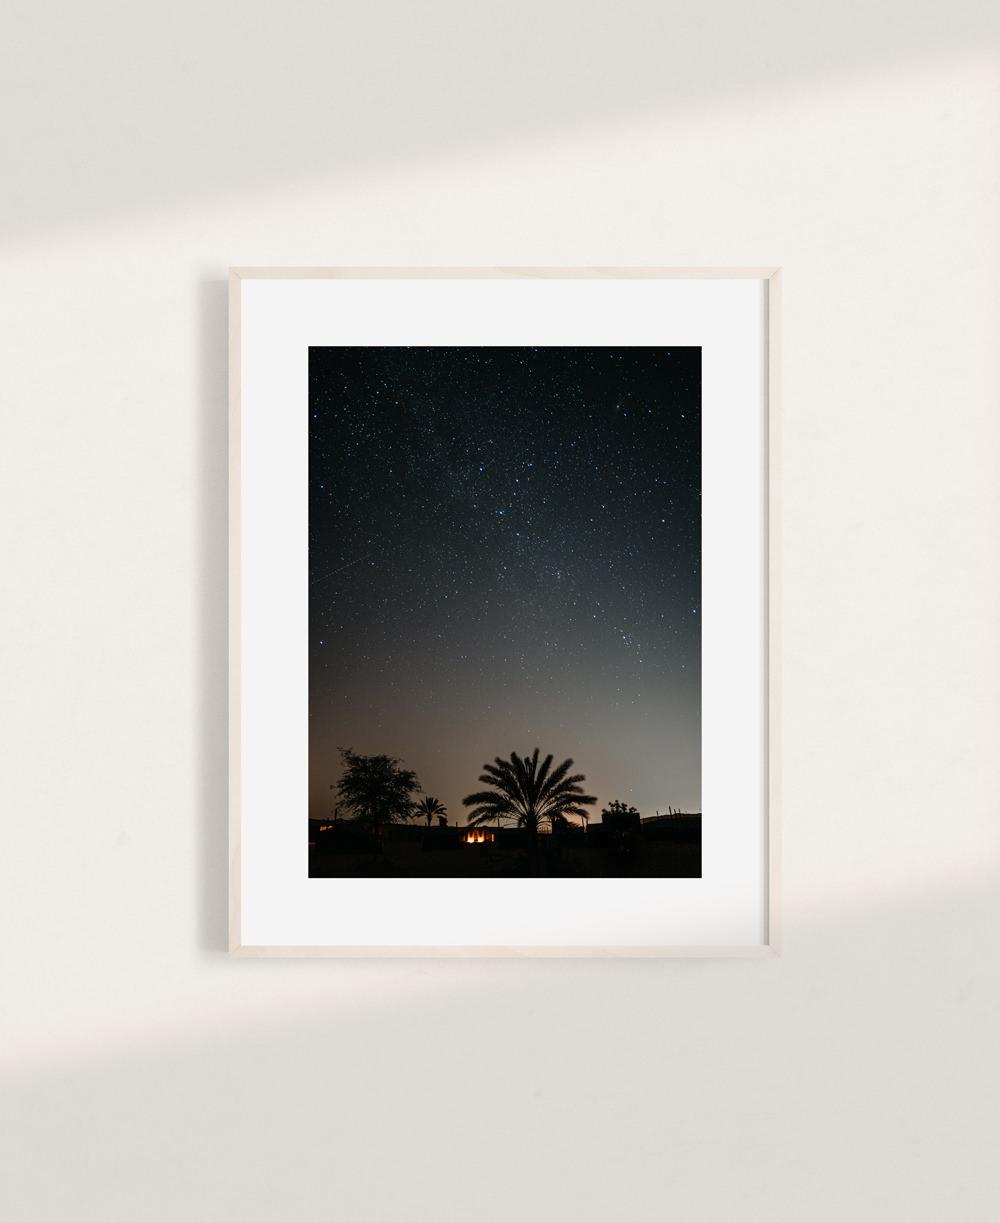 nicischwab-prints-016-sternenhimmel